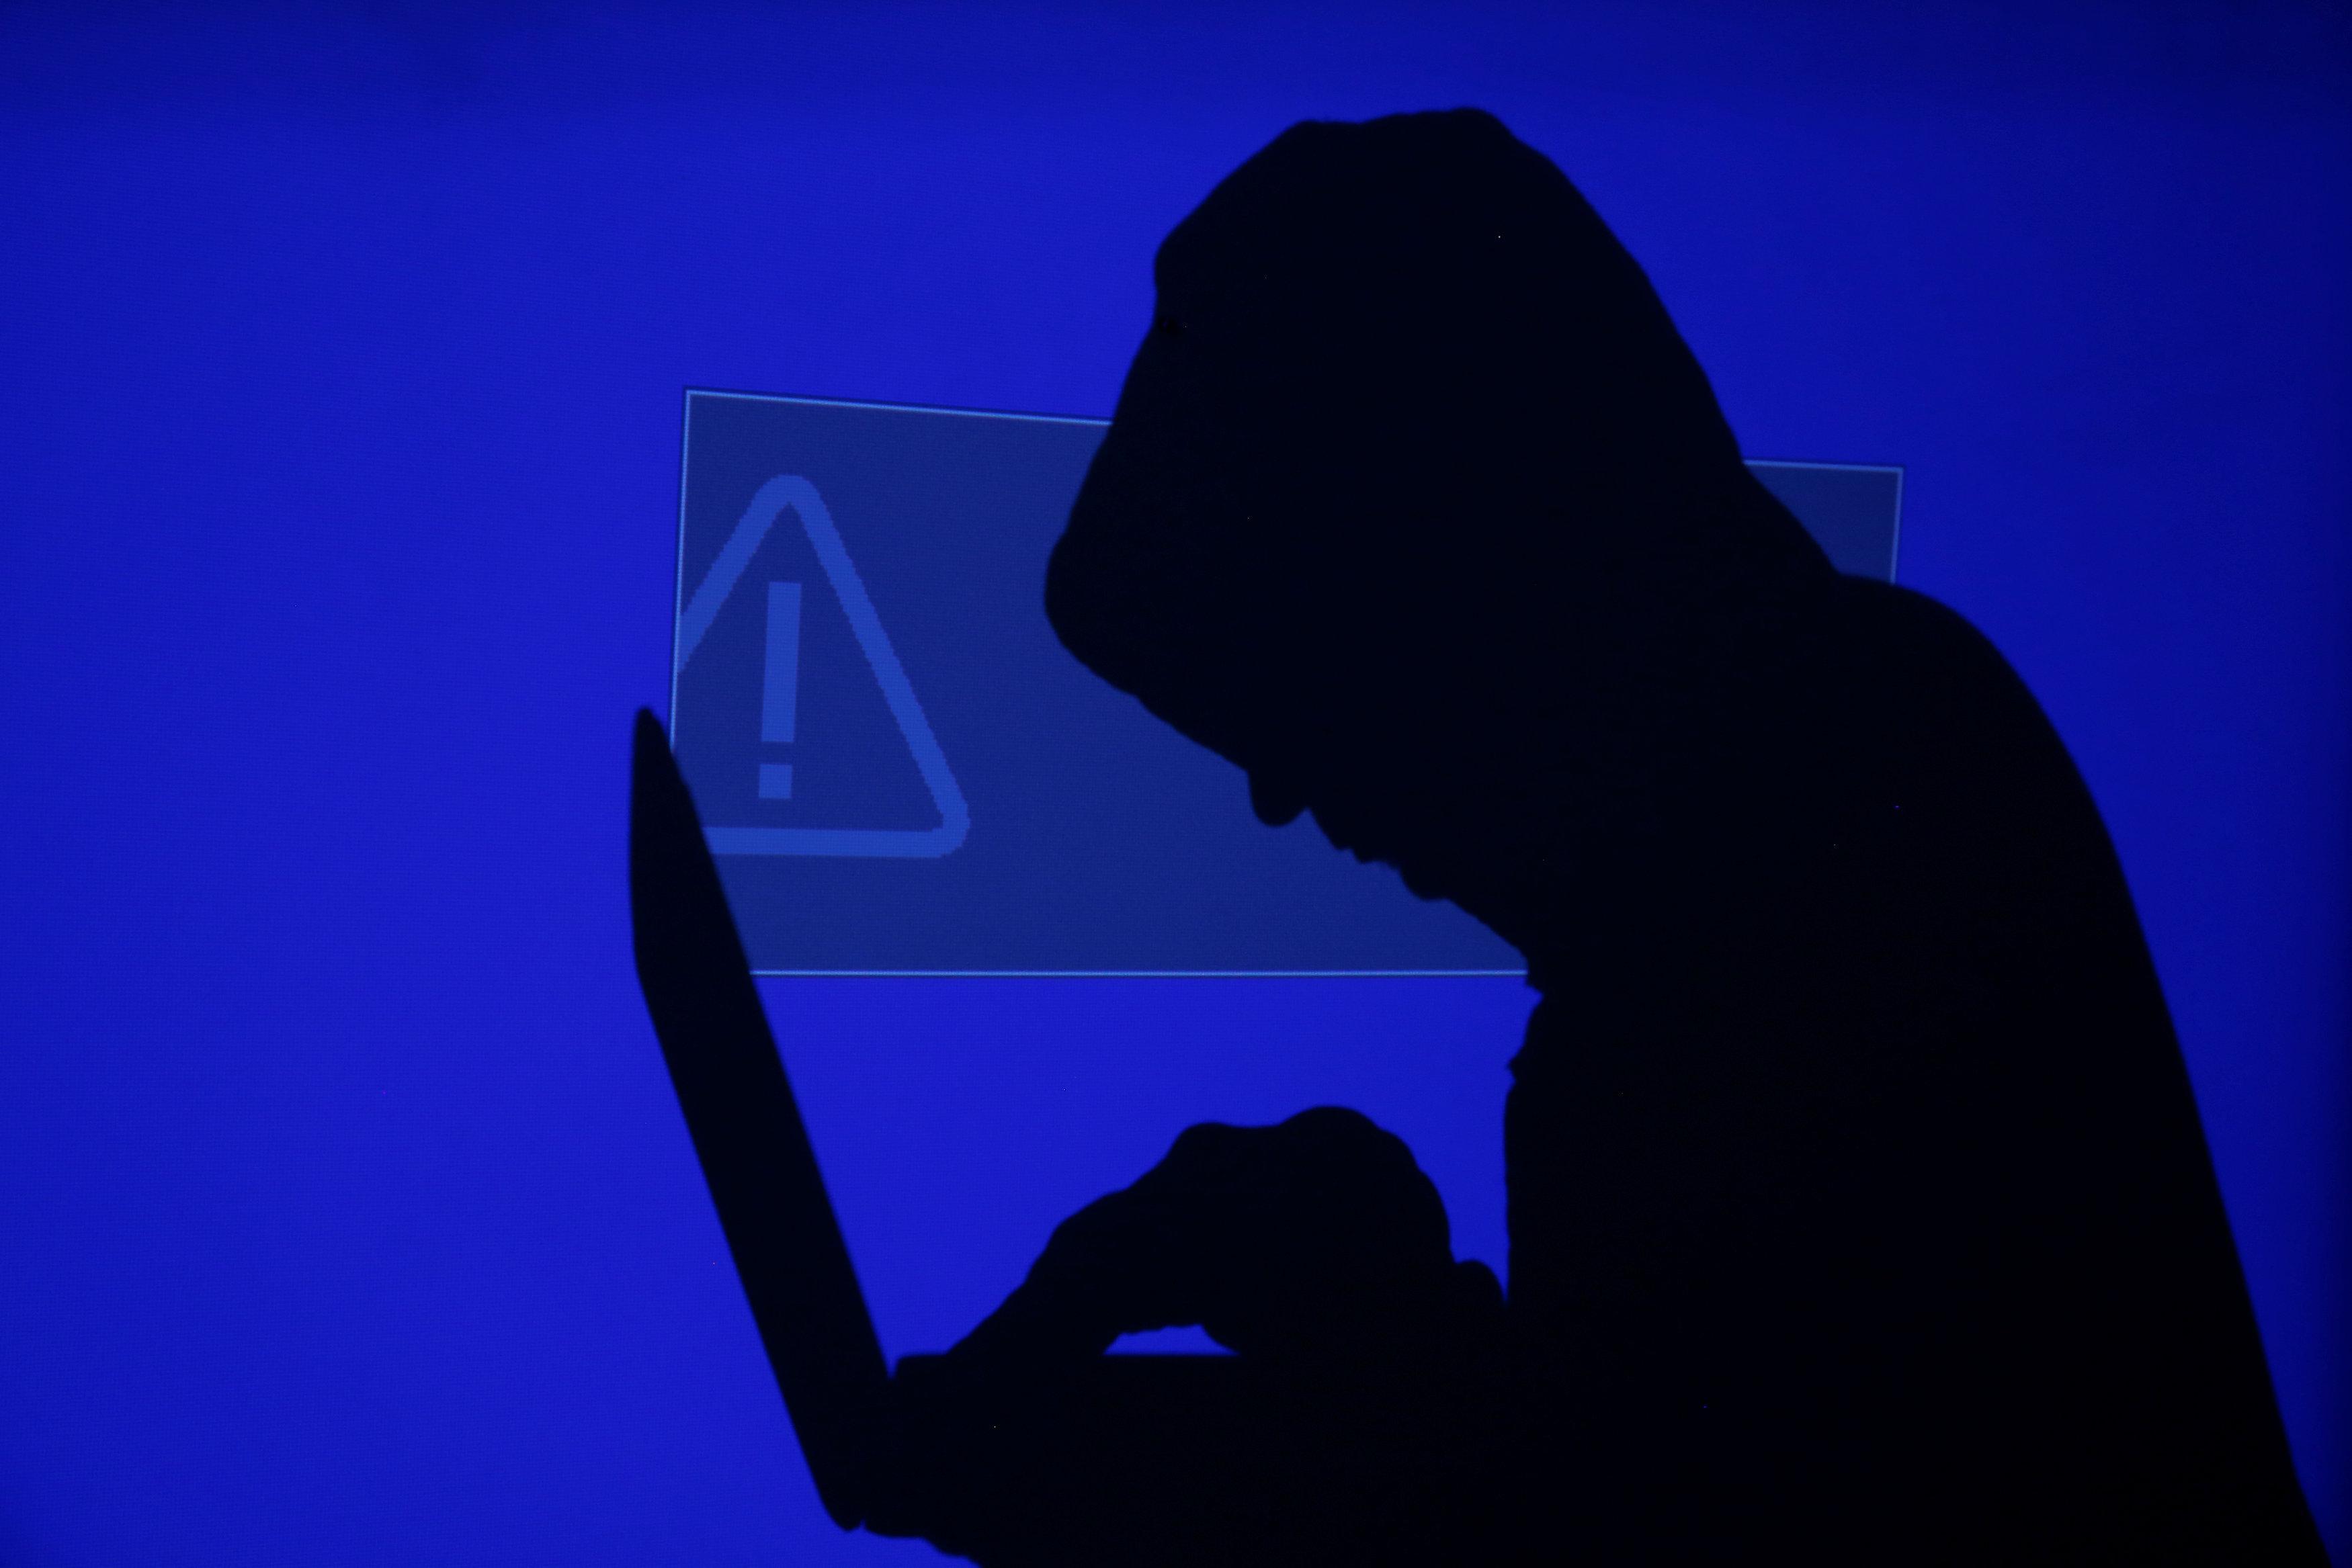 Hackers demand $70M after Kaseya ransomware attack